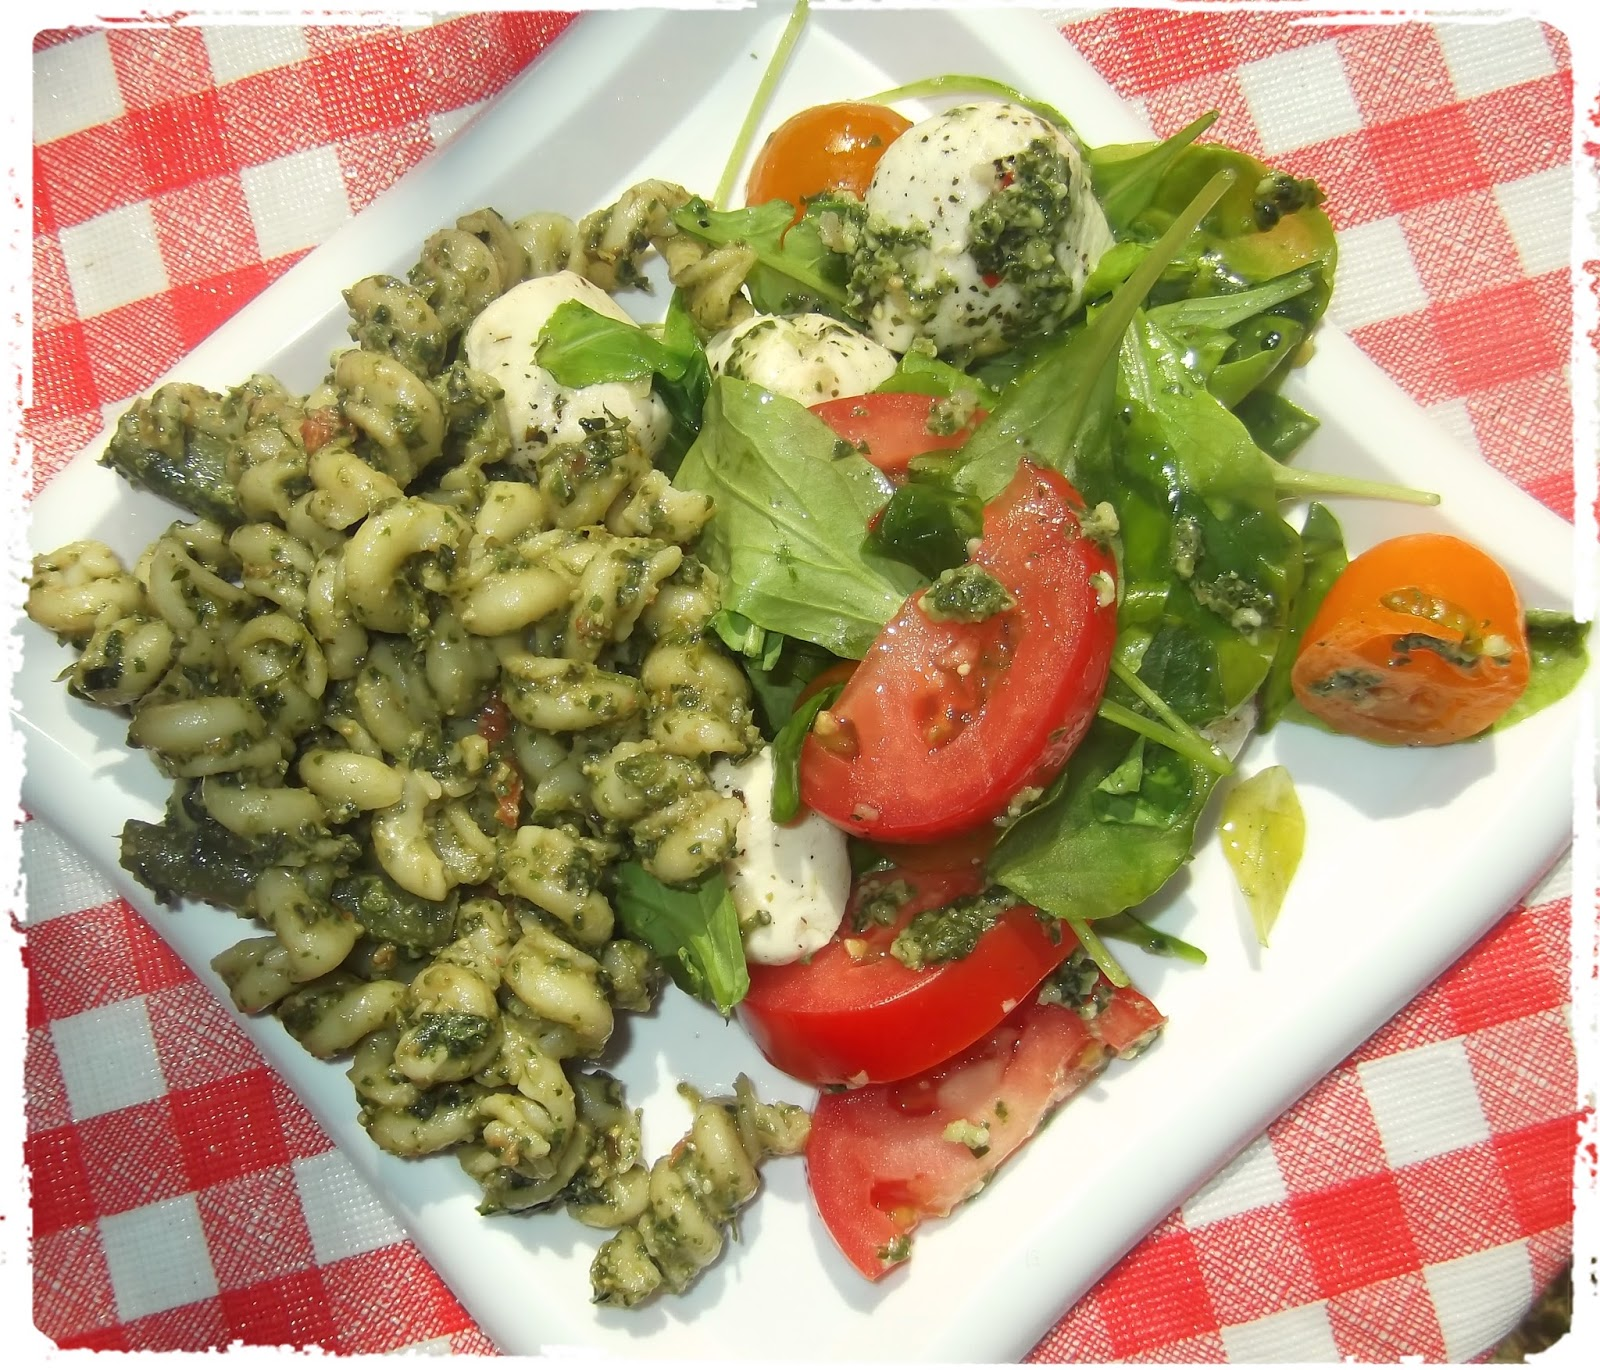 Ina Garten Green Salad: Rosie's Country Baking: Pesto Pasta Salad With Spinach